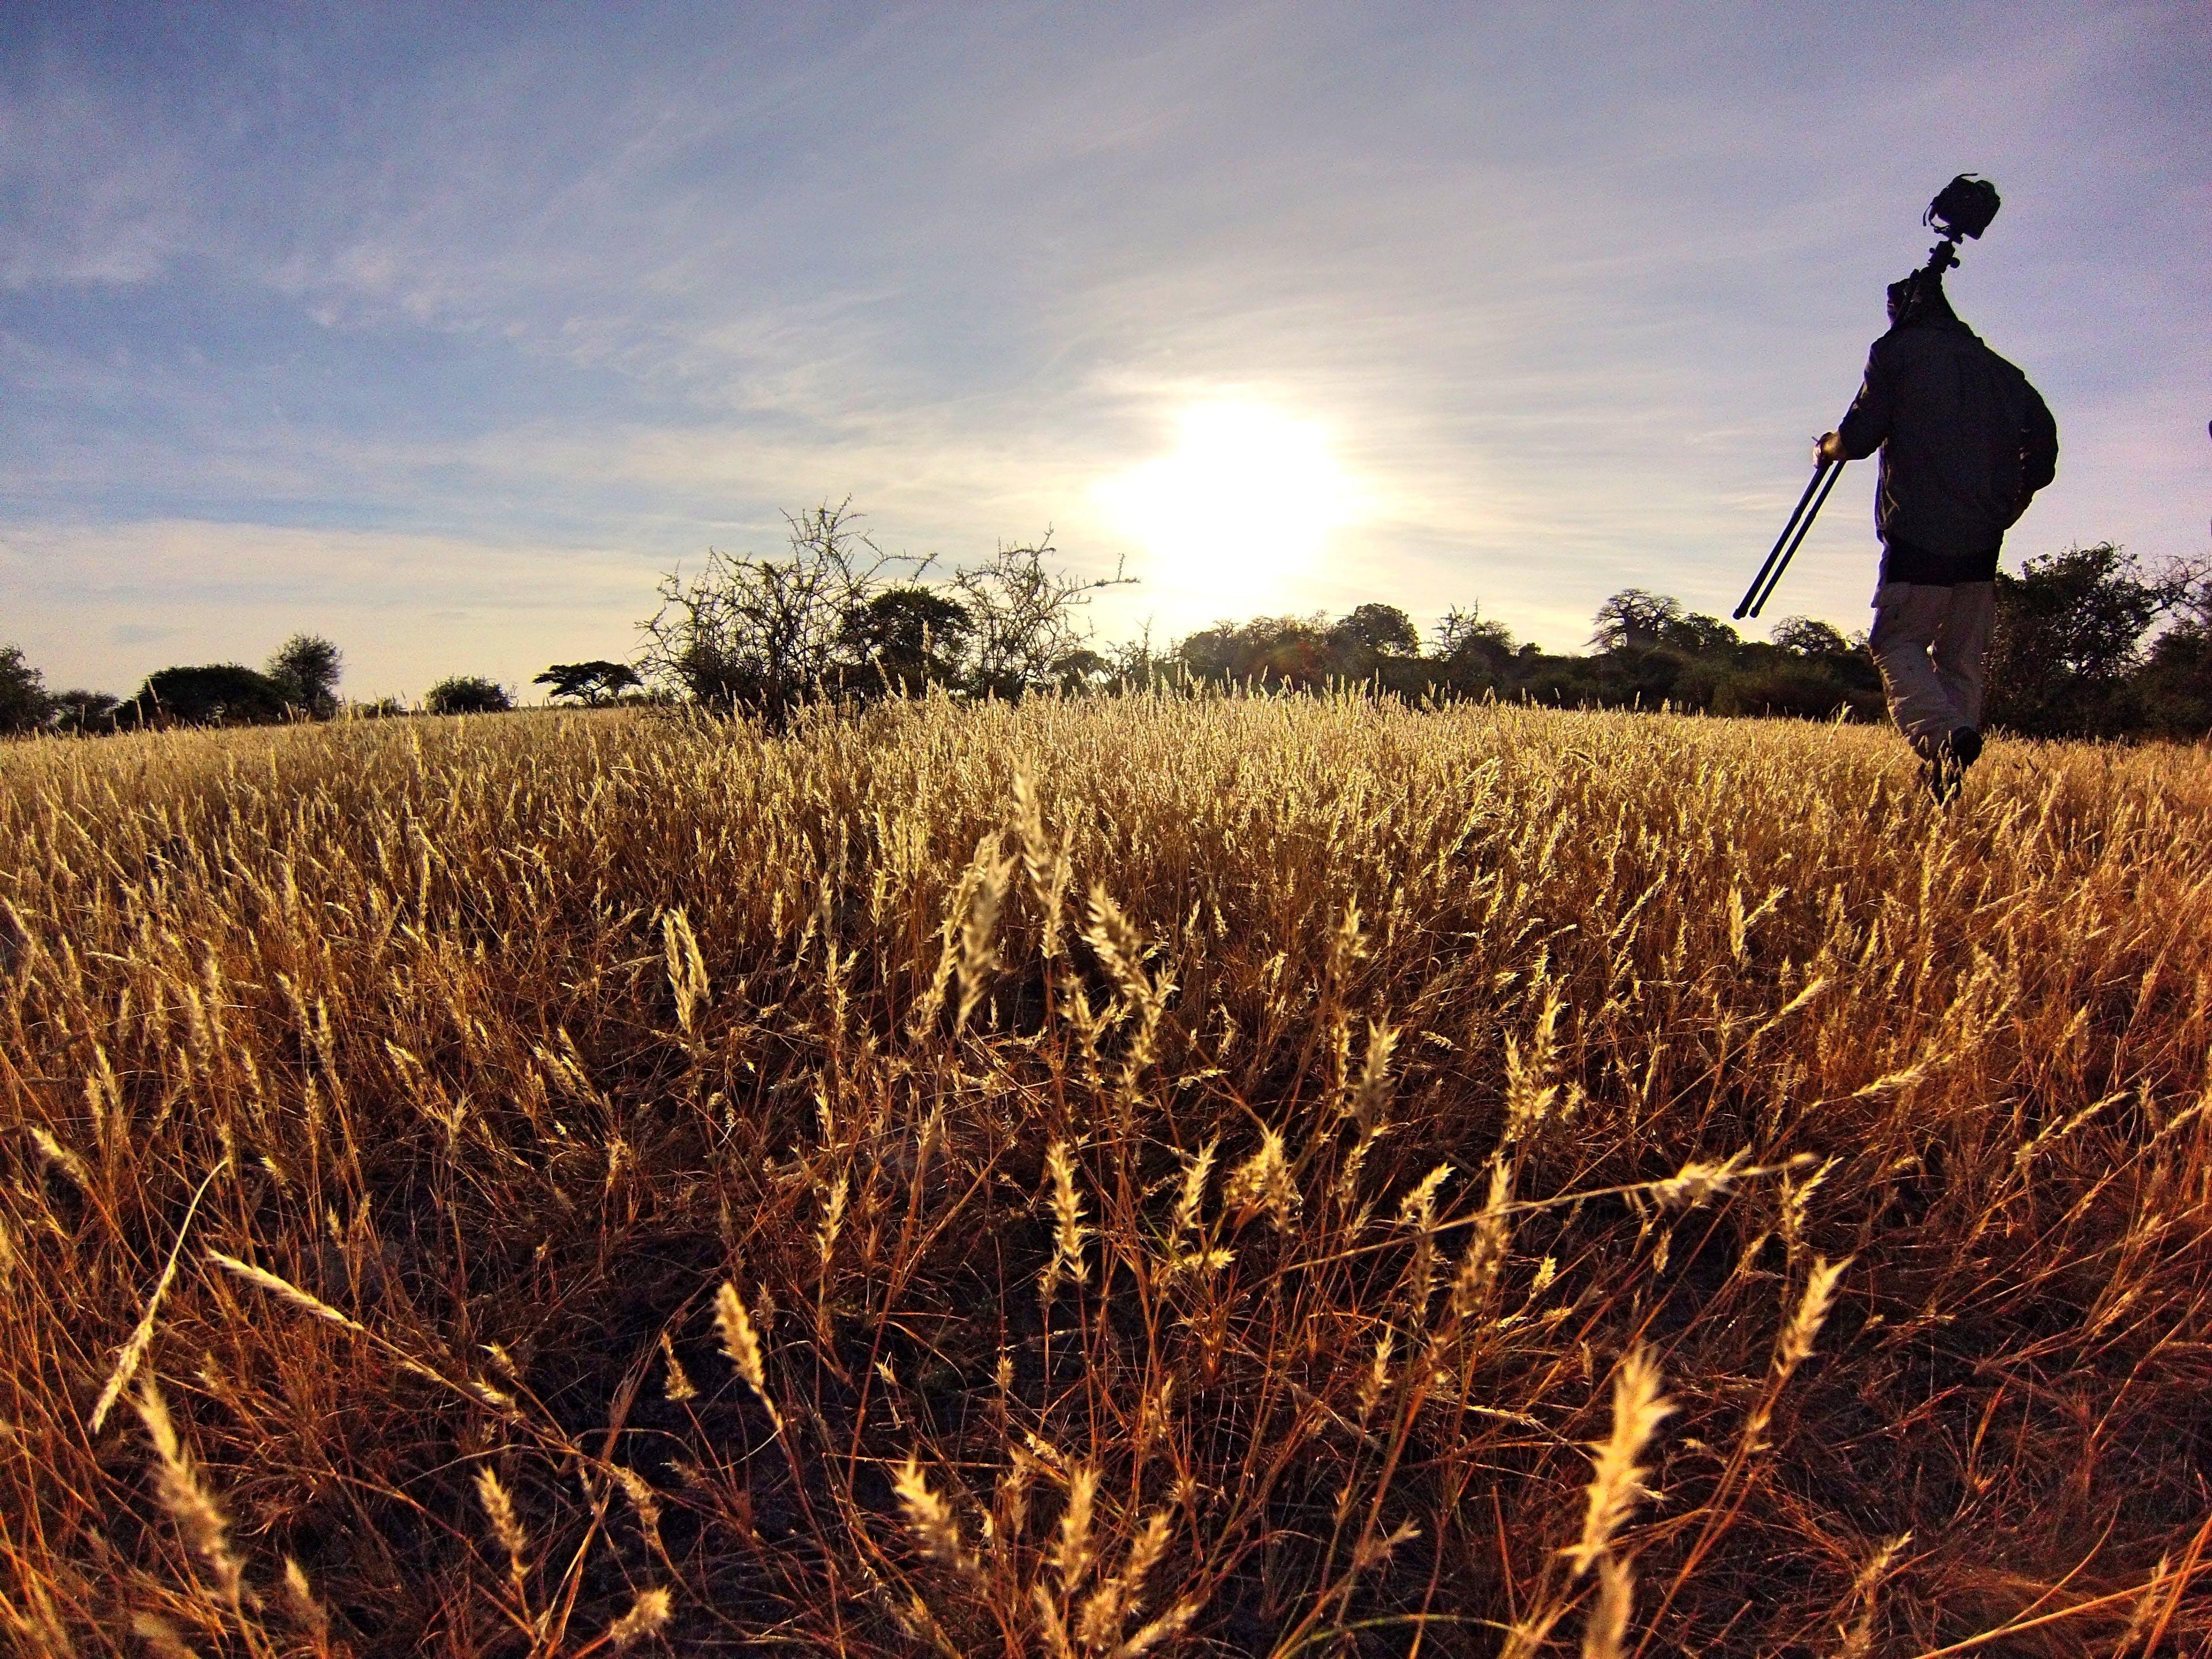 Man in Black Long Sleeve Shirt Holding Camera Tripod Walking on Wheat Fields at Daytime